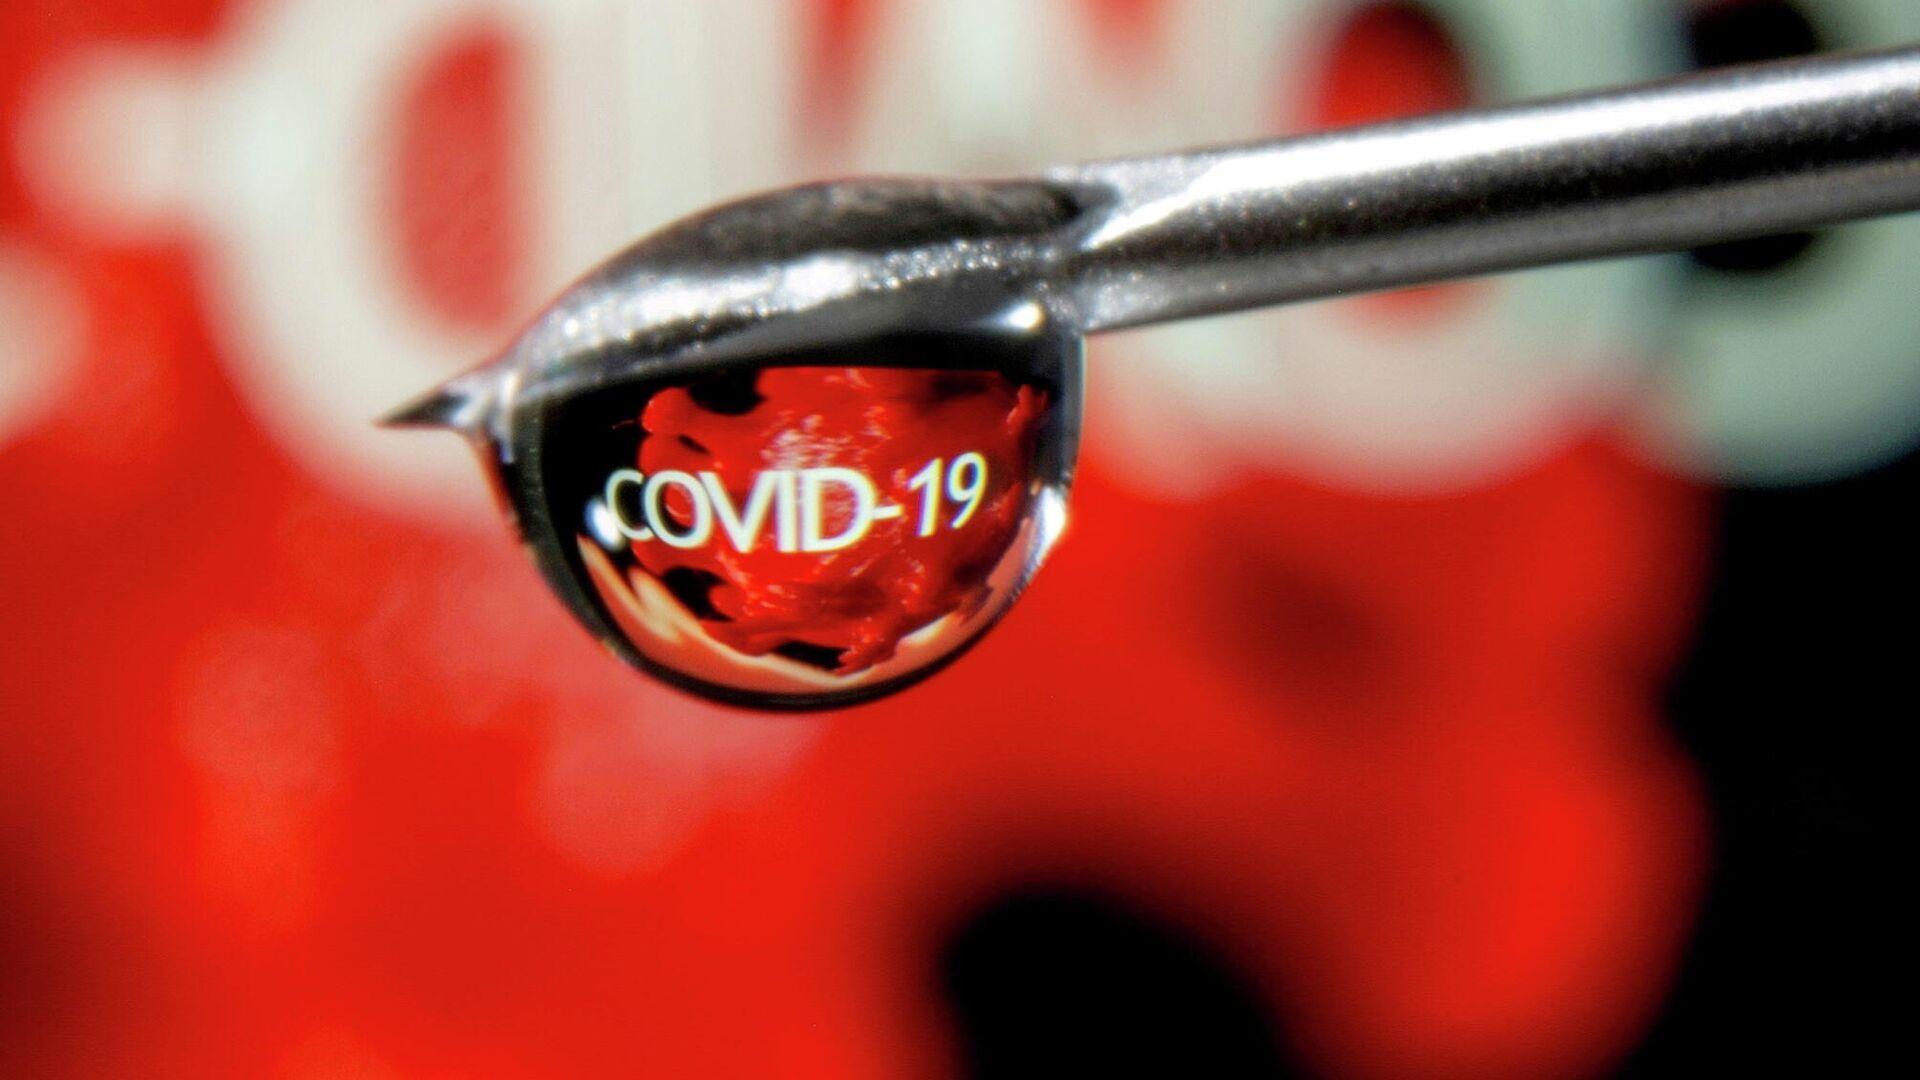 Слово COVID-19 в капле на игле шприца - РИА Новости, 1920, 02.07.2021